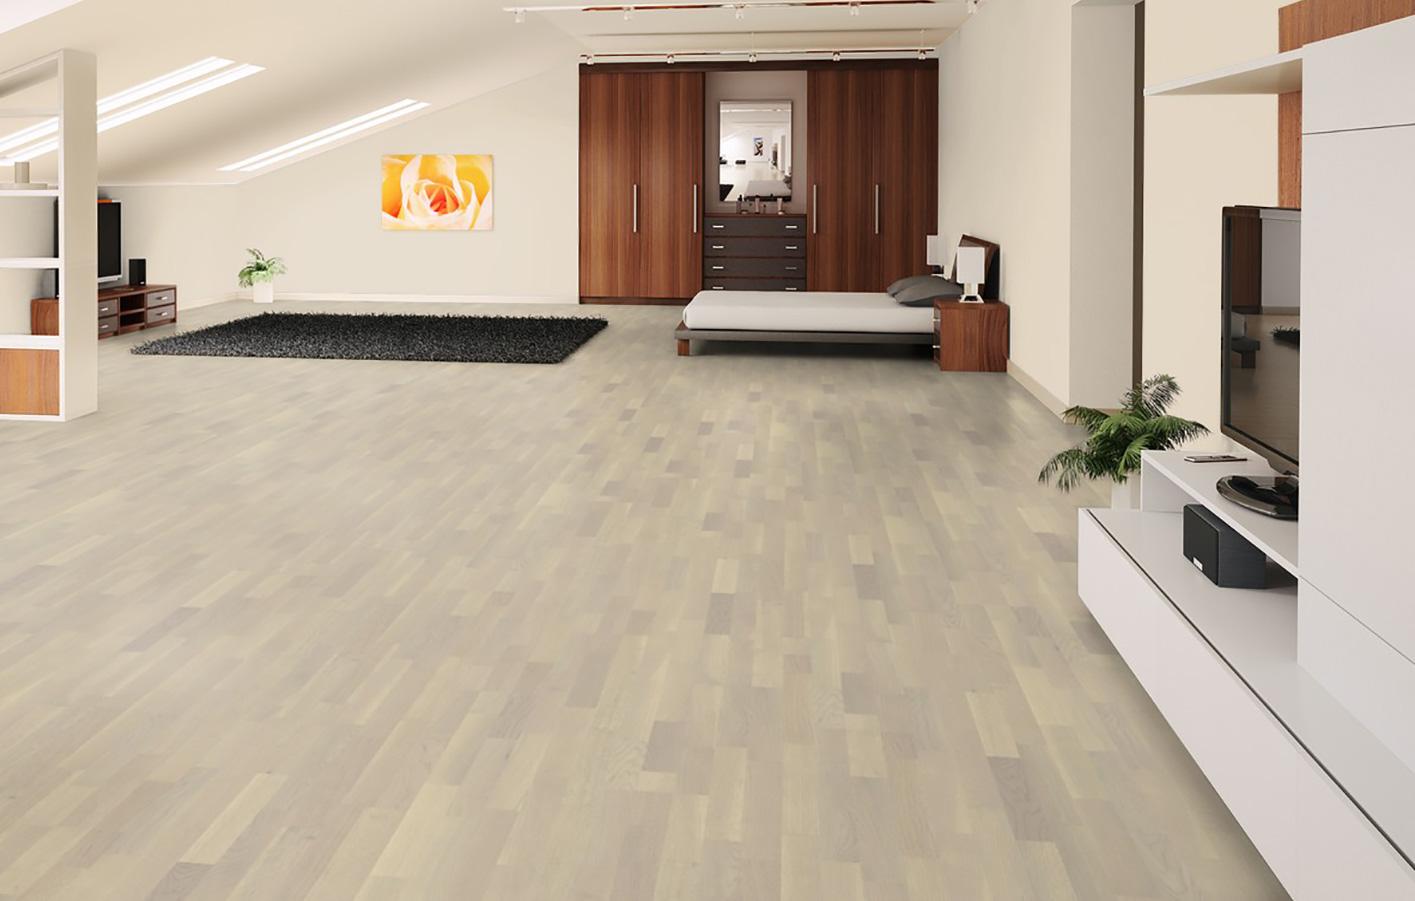 Fußboden Verlegen Nürnberg ~ Fertigparkett landhausdielen vinylboden nürnberg erlangen fürth